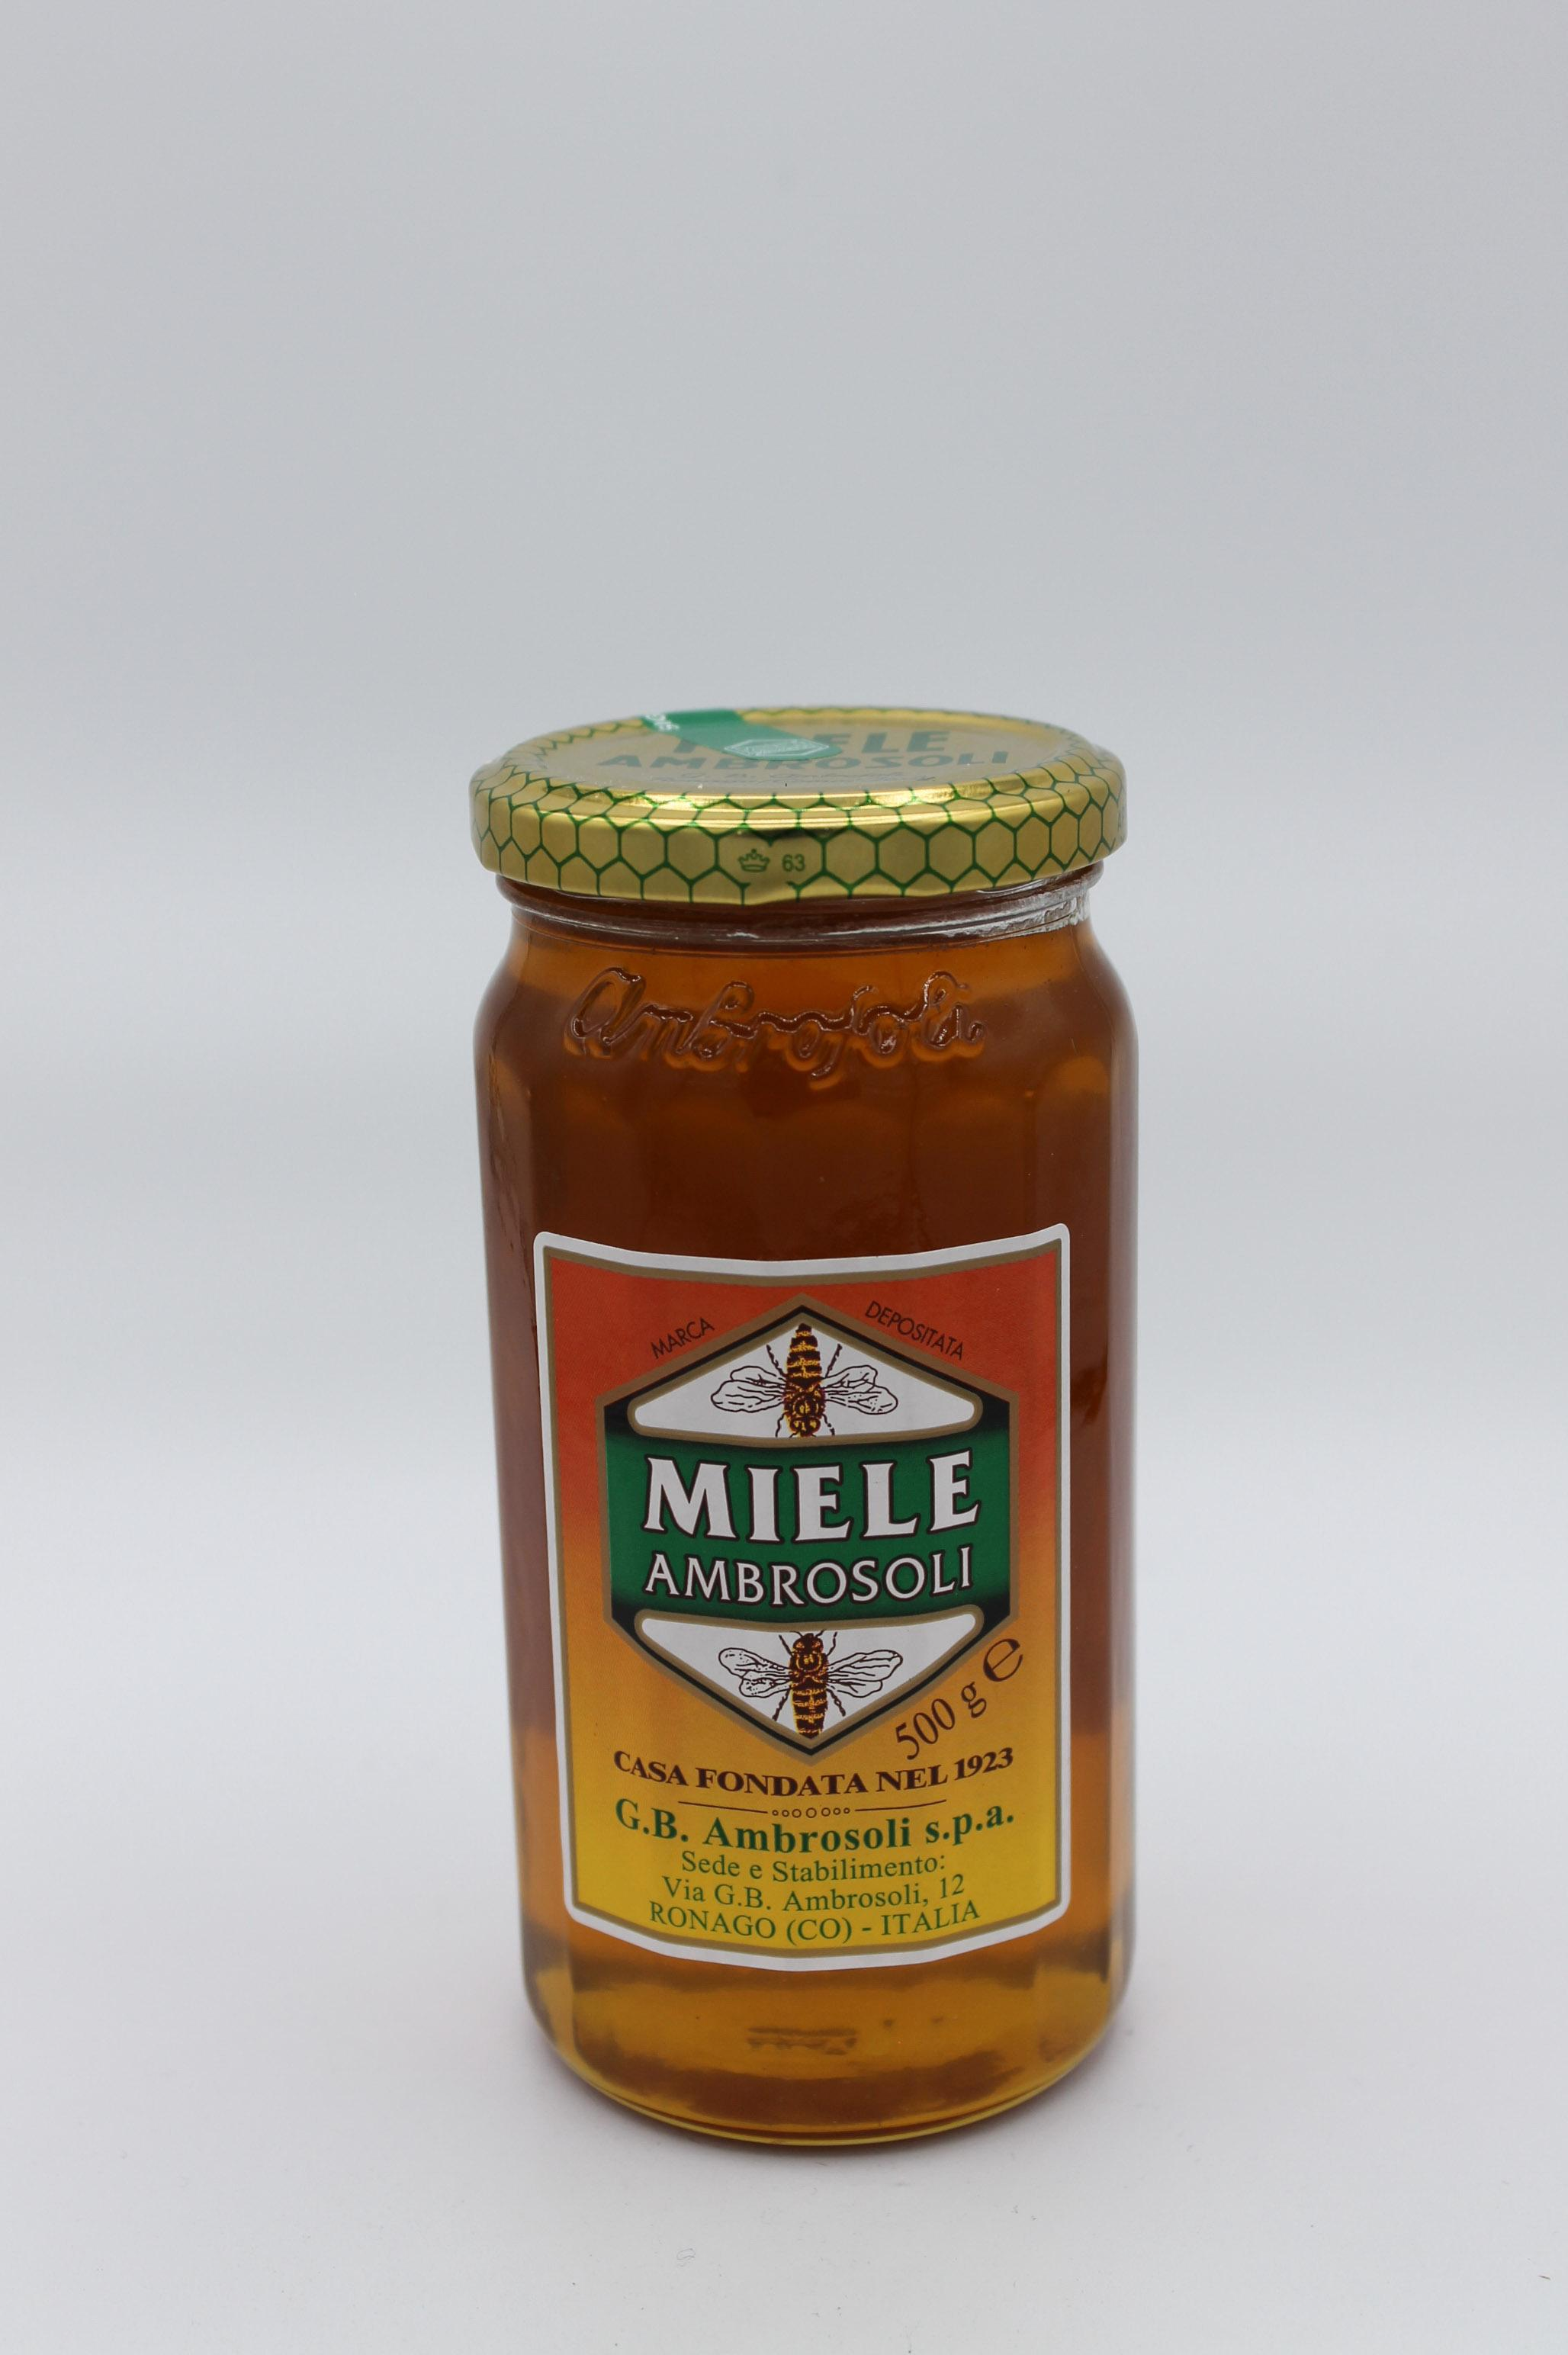 Ambrosoli miele 500 gr.